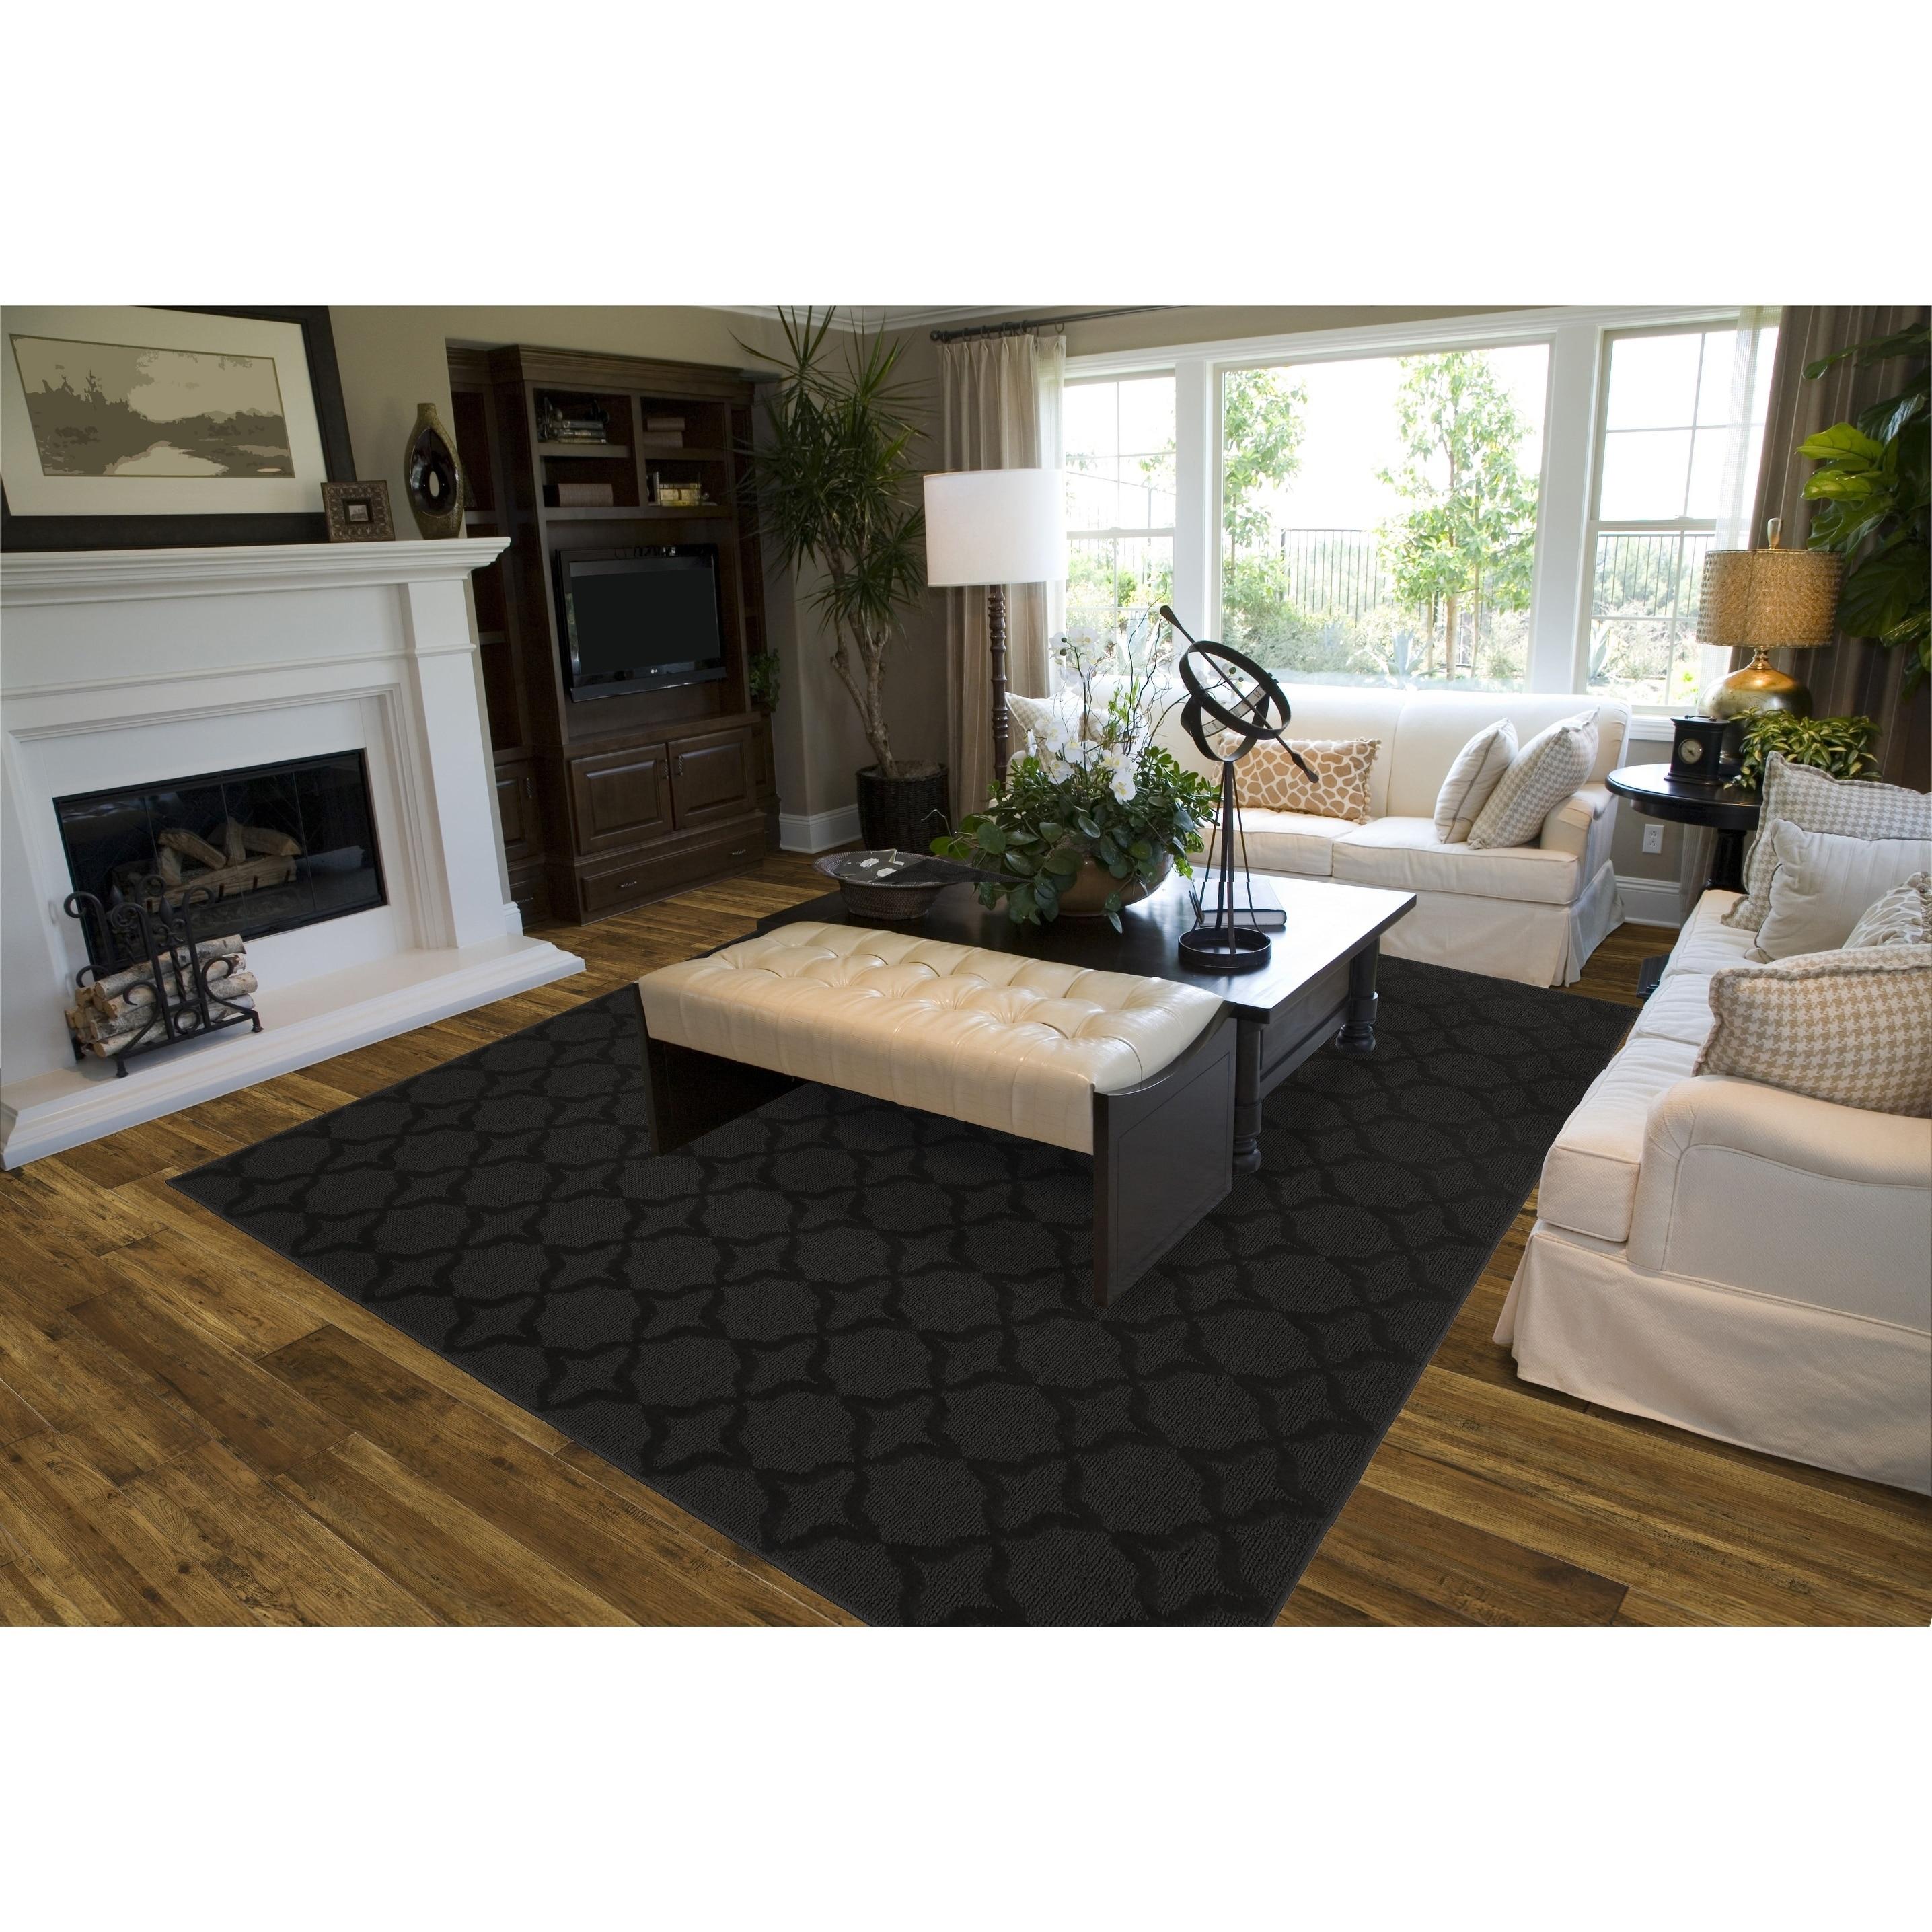 Excellent Sparta Black Living Room Area Rug Download Free Architecture Designs Sospemadebymaigaardcom